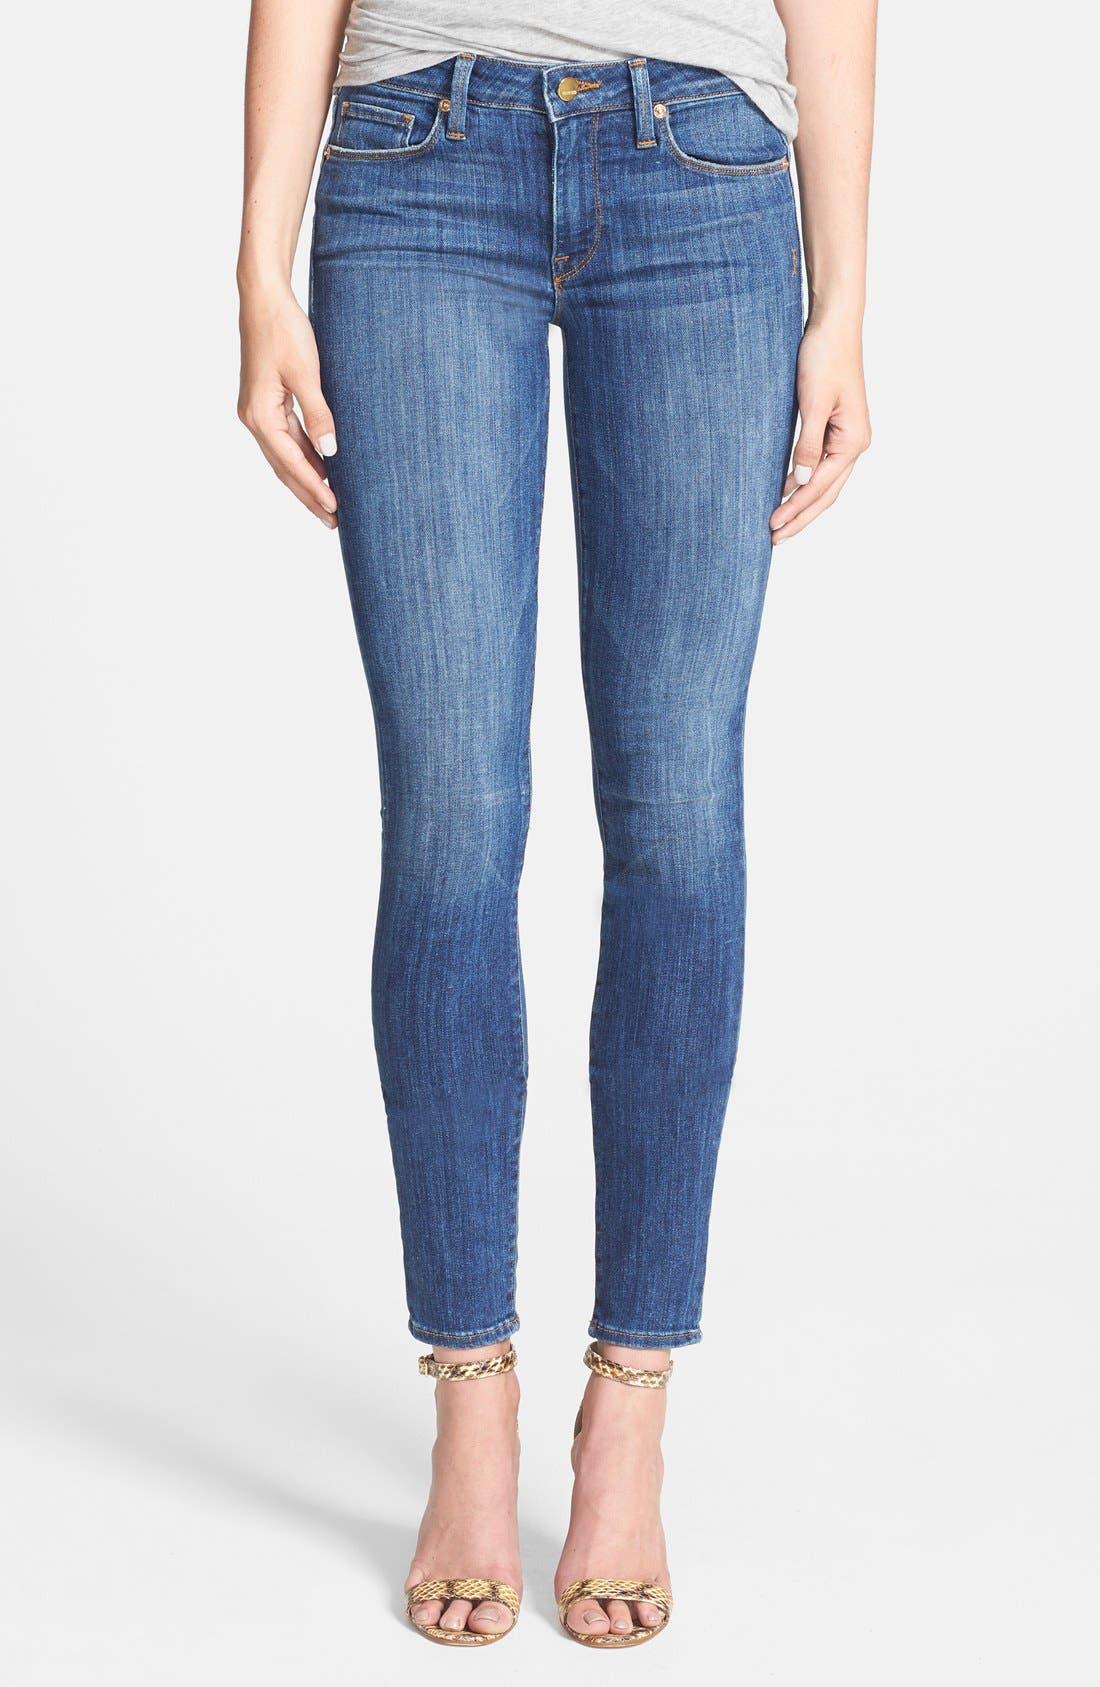 Alternate Image 1 Selected - Genetic 'Stem' Mid Rise Skinny Jeans (Arena)